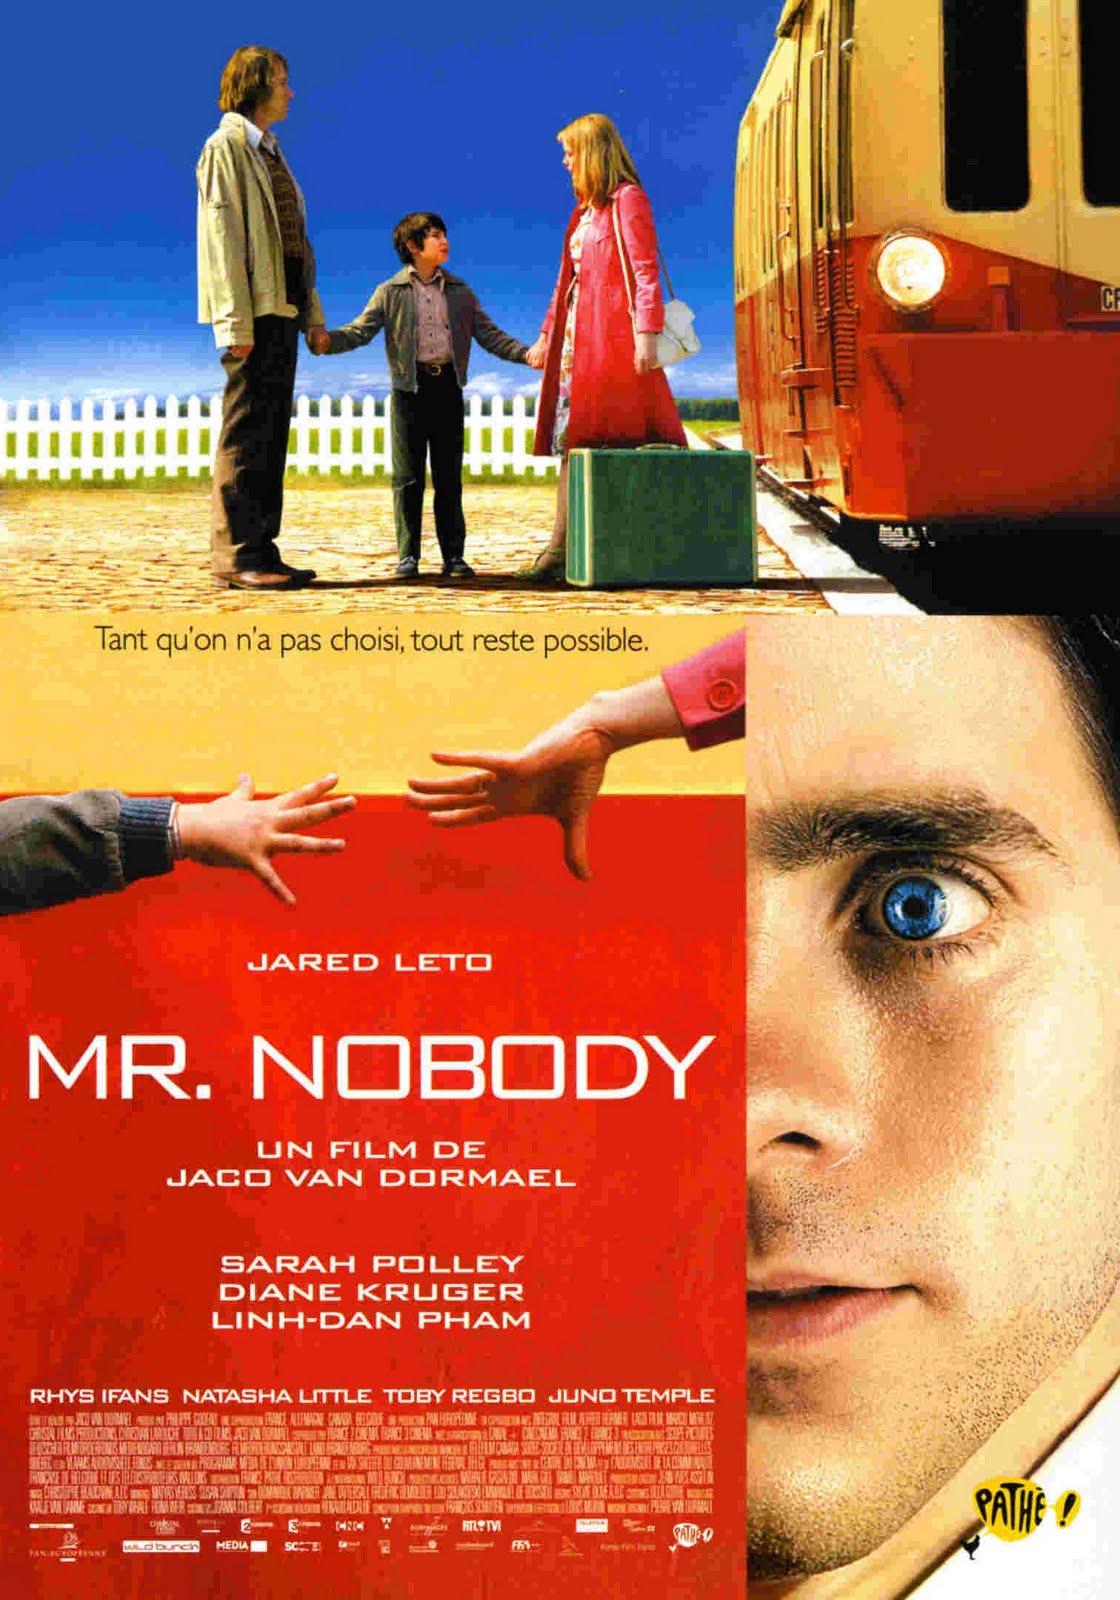 http://4.bp.blogspot.com/_ViaYyPR41iA/TG_DujJswII/AAAAAAAAFYU/R0wI05z1oyc/s1600/Mr_Nobody_(2010).jpg